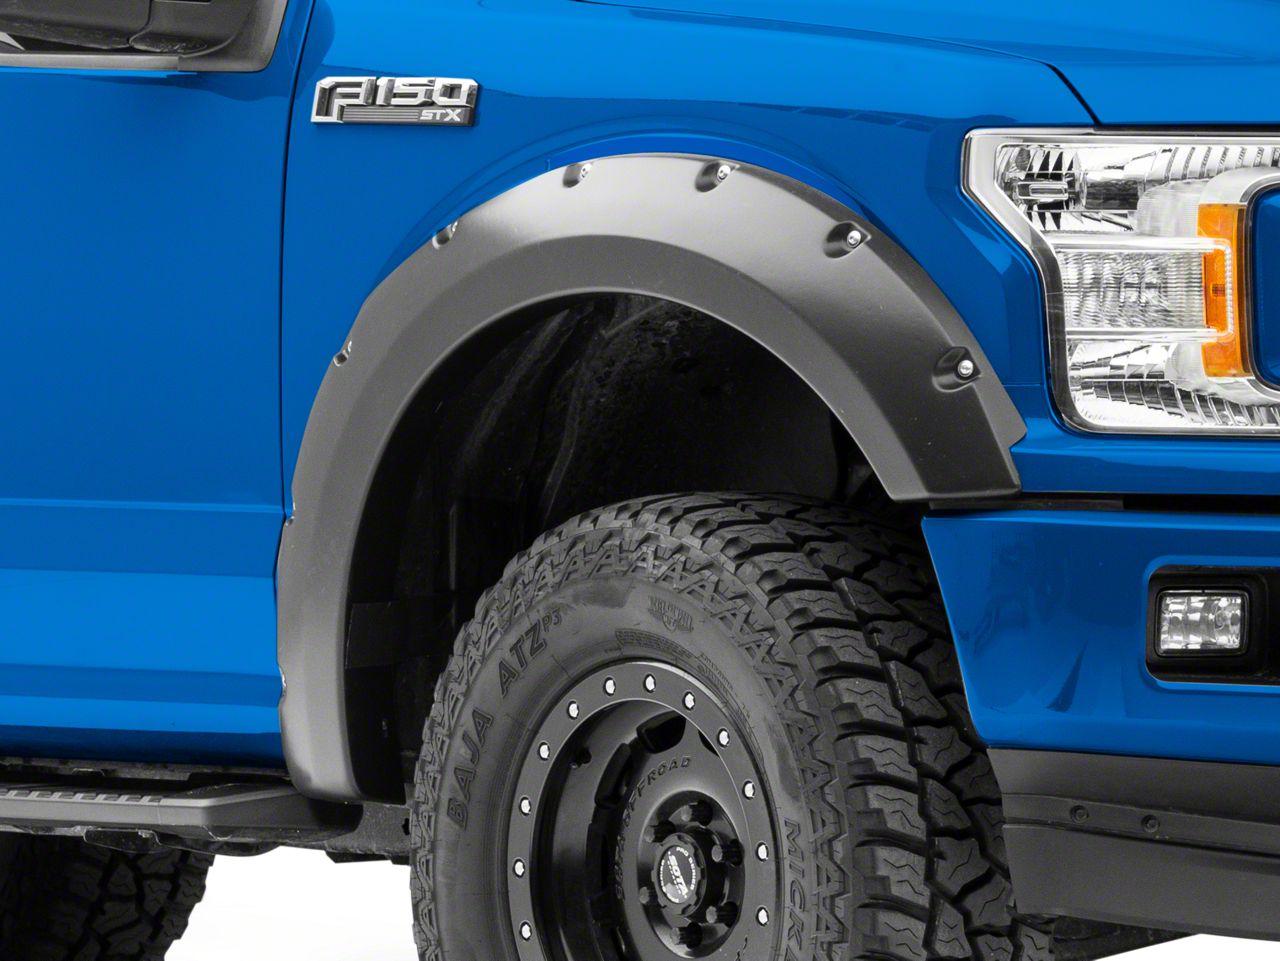 For 18-20 Ford F150 Rough Textured Pocket Rivet Bolt-On Style Fender Flares 4PC